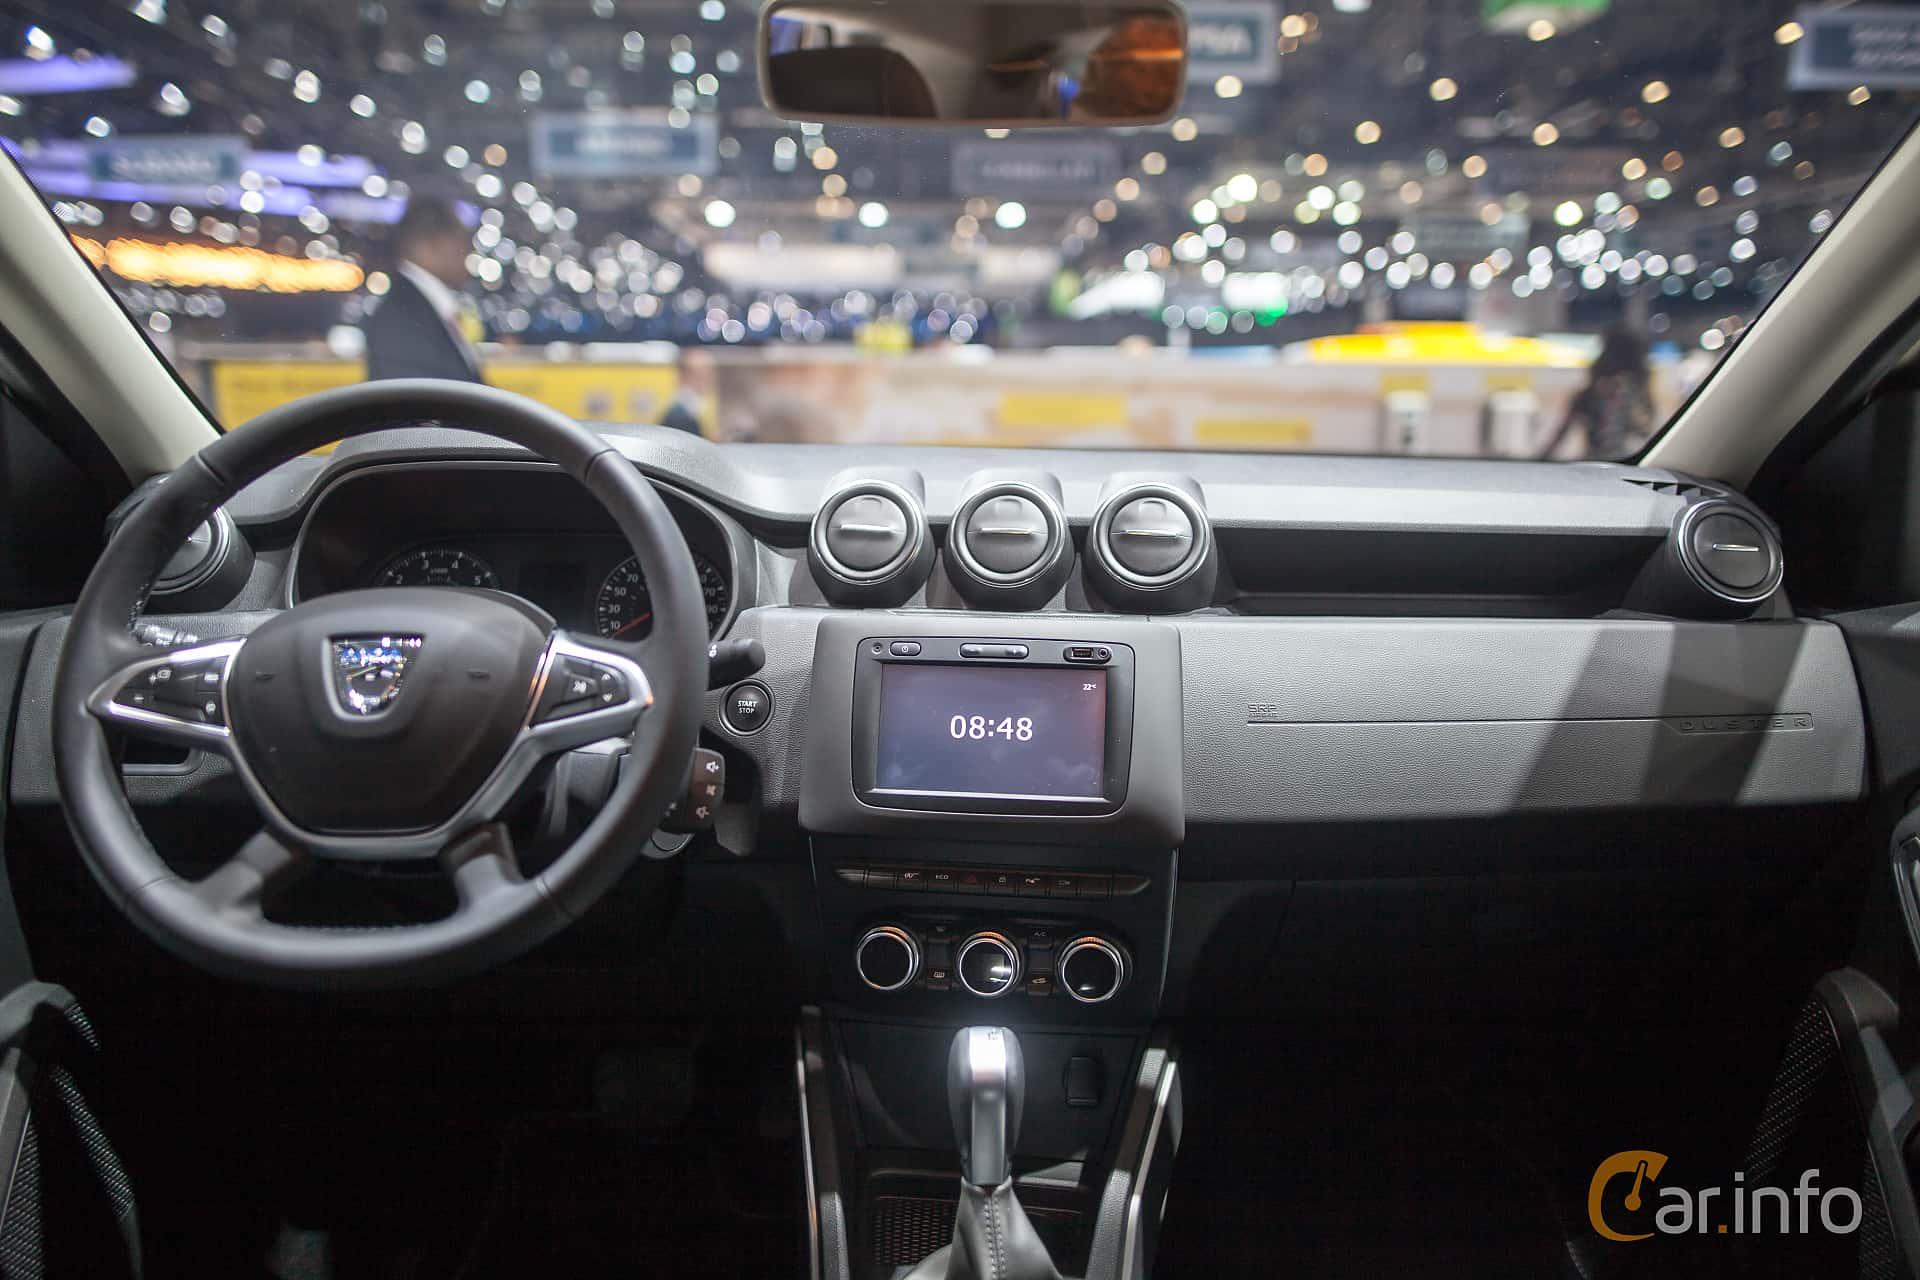 https://s.car.info/image_files/1920/dacia-duster-interior-geneva-motor-show-2018-3-517259.jpg